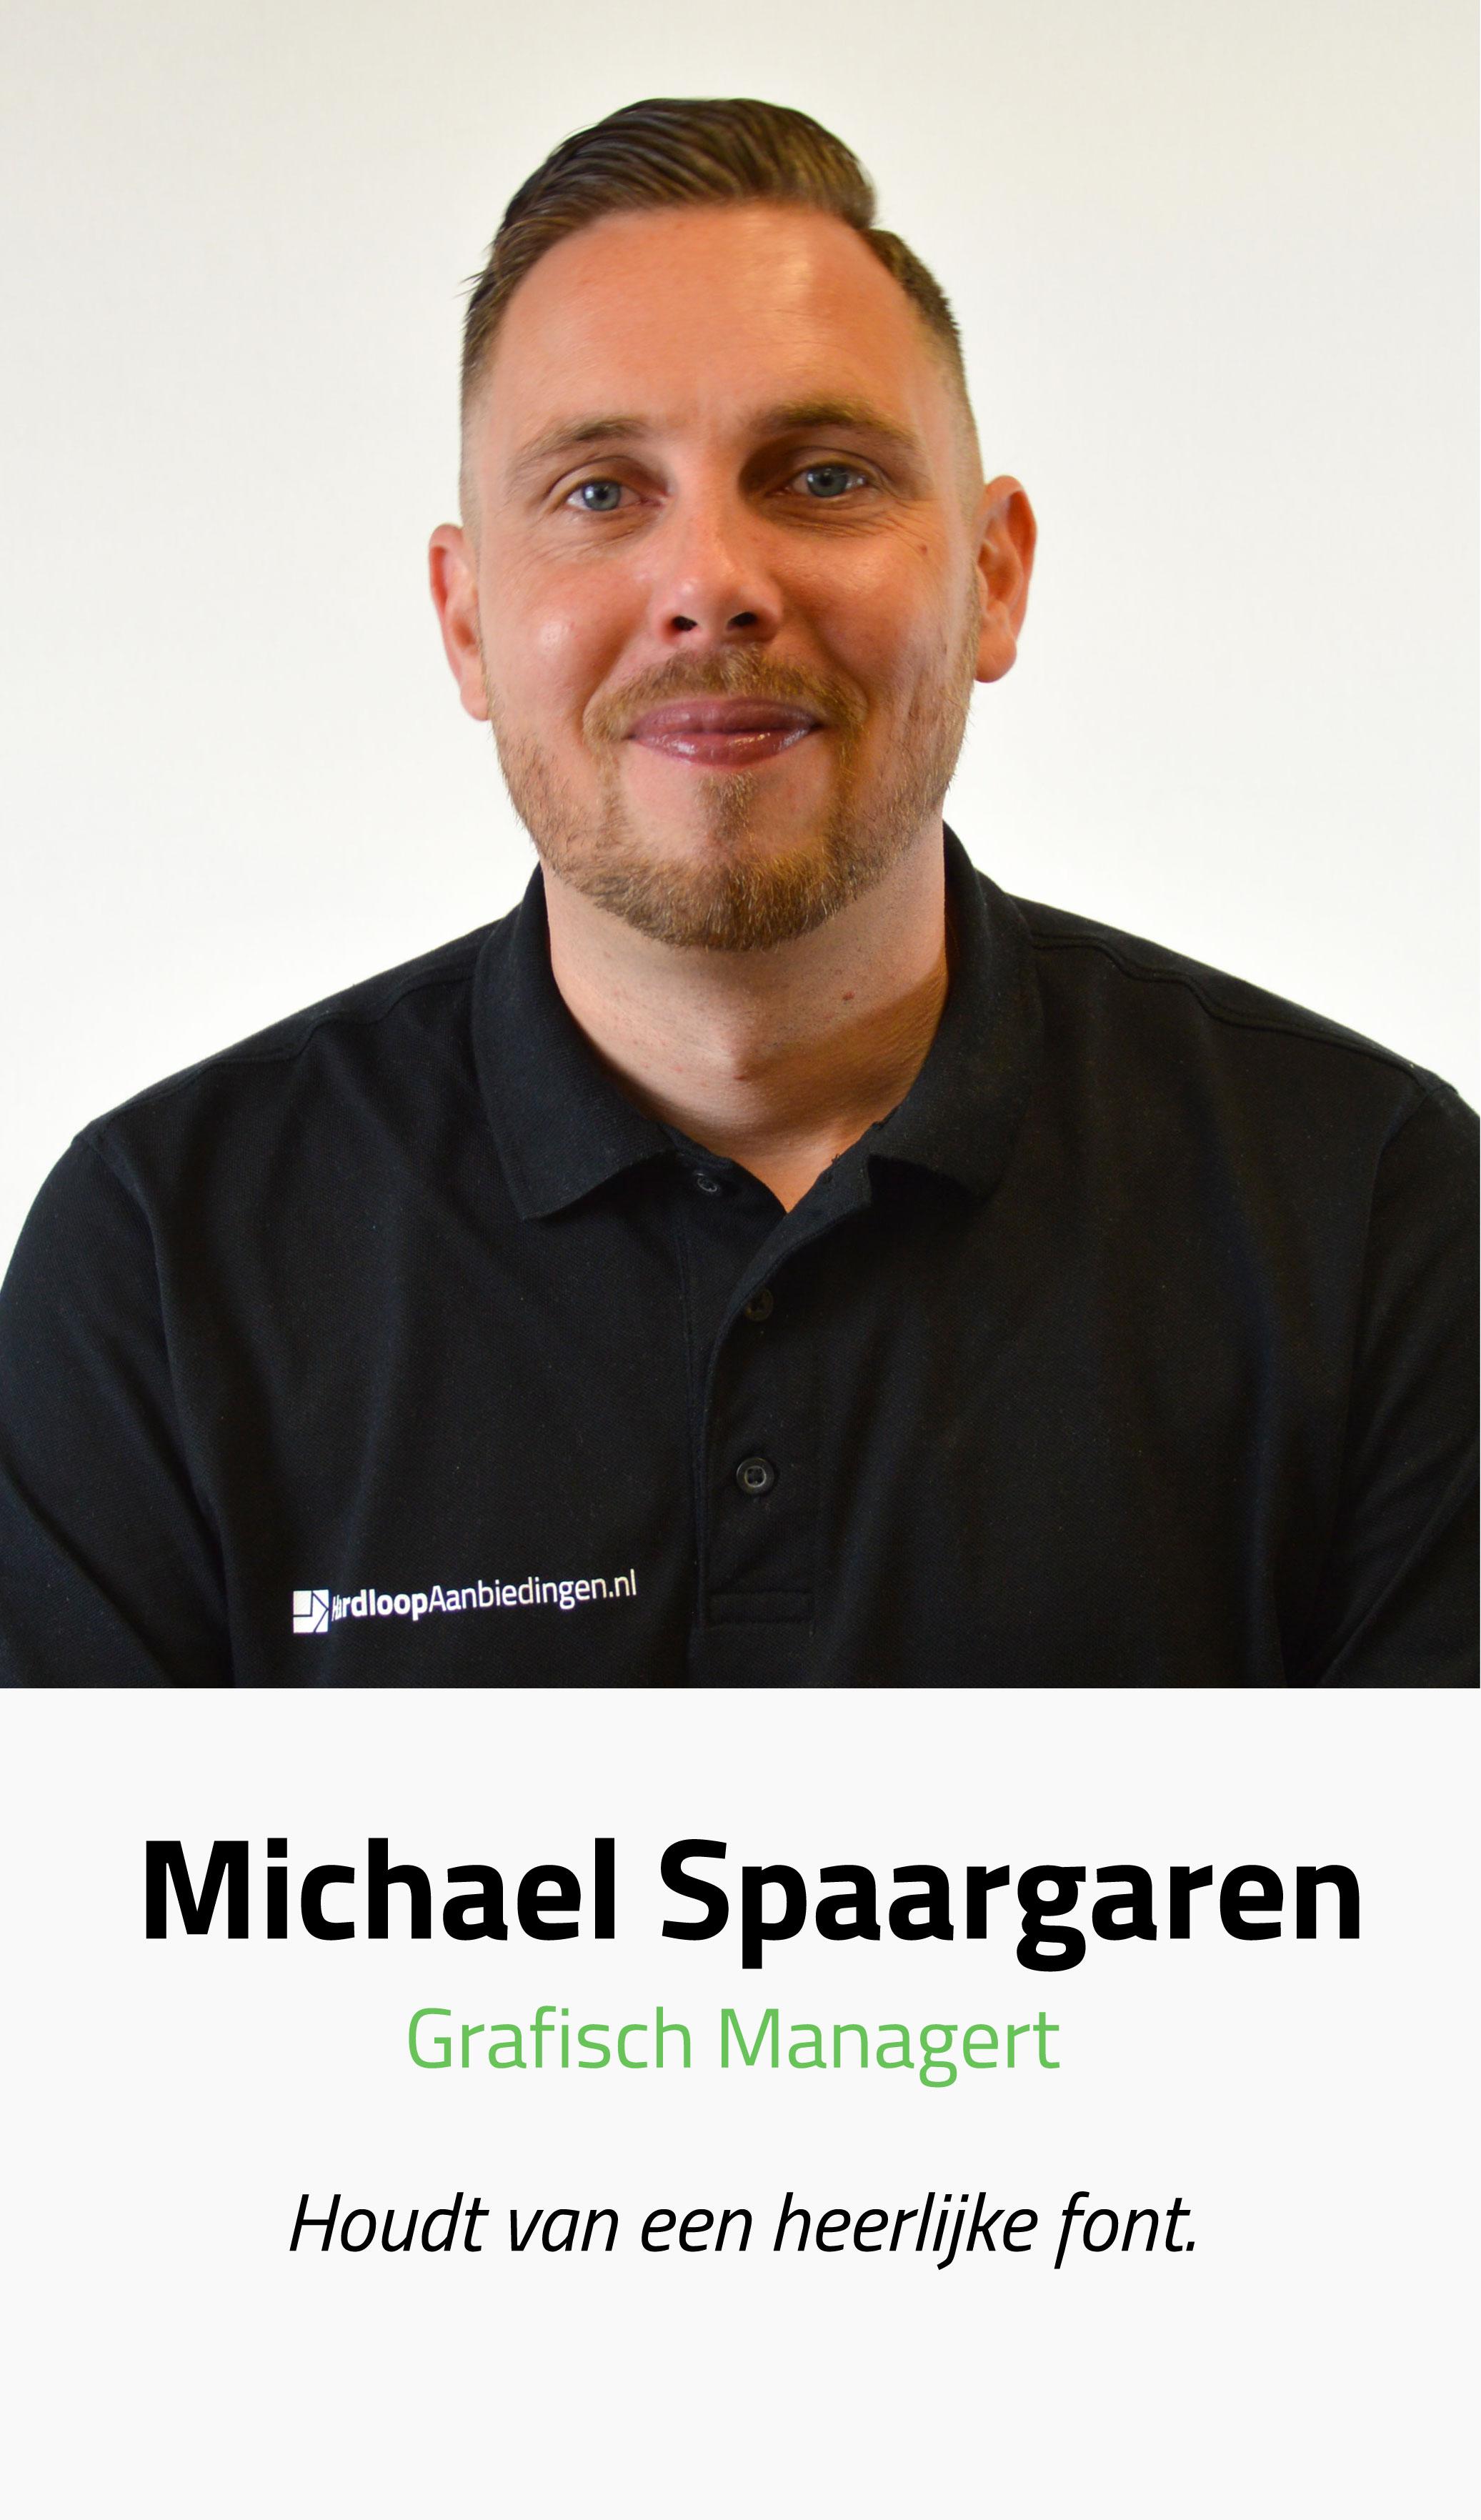 Mike | Hardloopaanbiedingen.nl